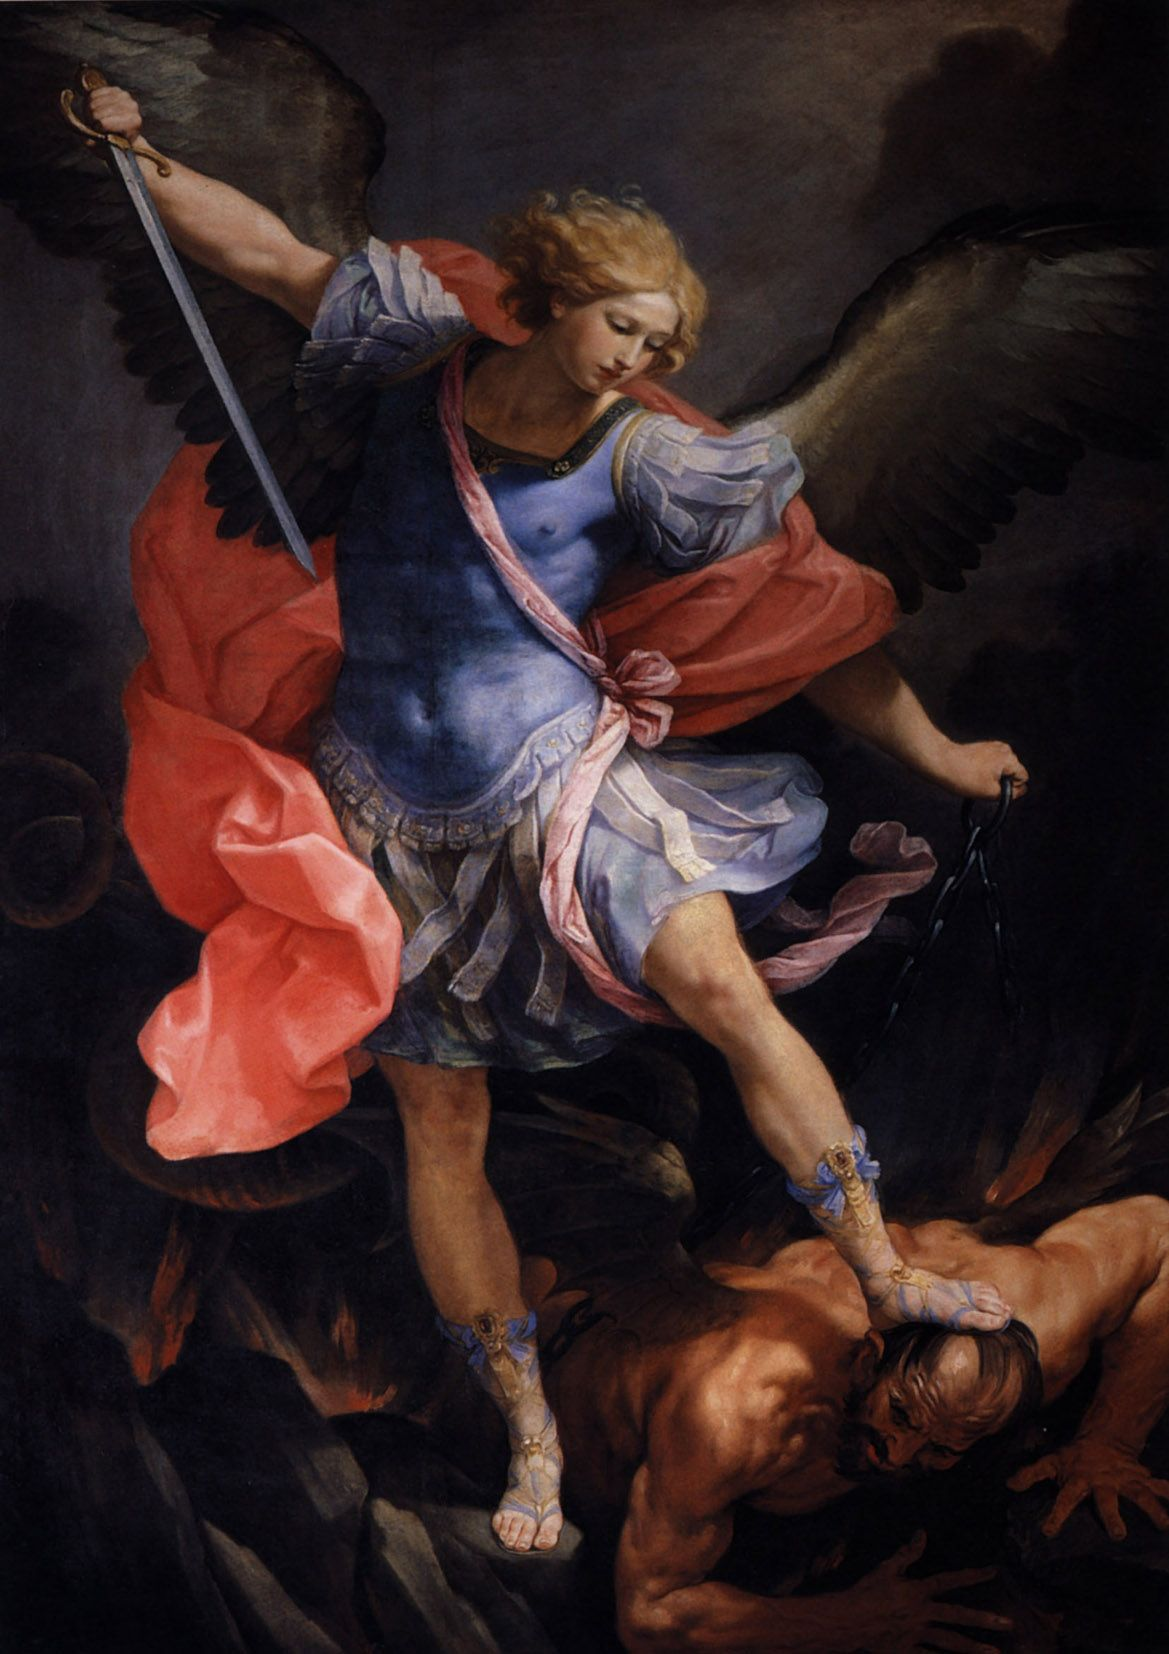 reni-guido-the-archangel-michael-defeating-satan.-fine-art-print-poster-canvas.-sizes-a3-a2-a1-671-p.jpg 1169×1654 pikseliä